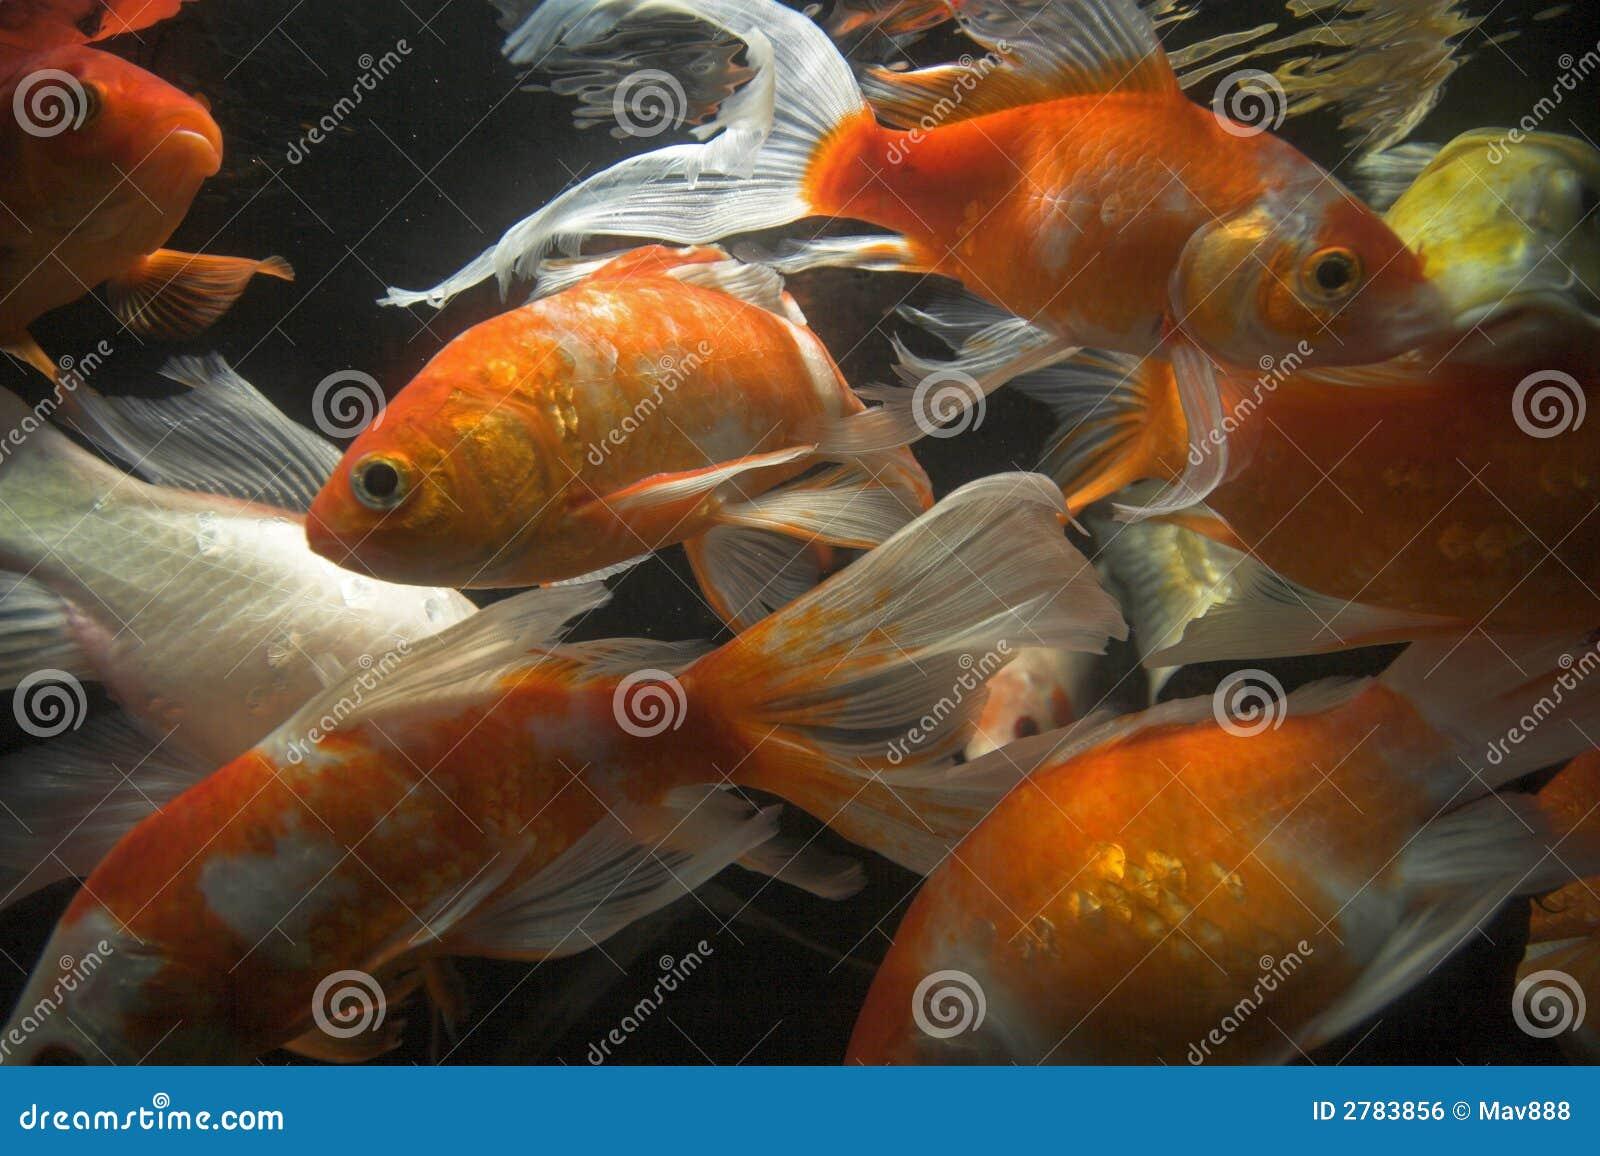 Koi fish underwater royalty free stock image image 2783856 for Koi fish family